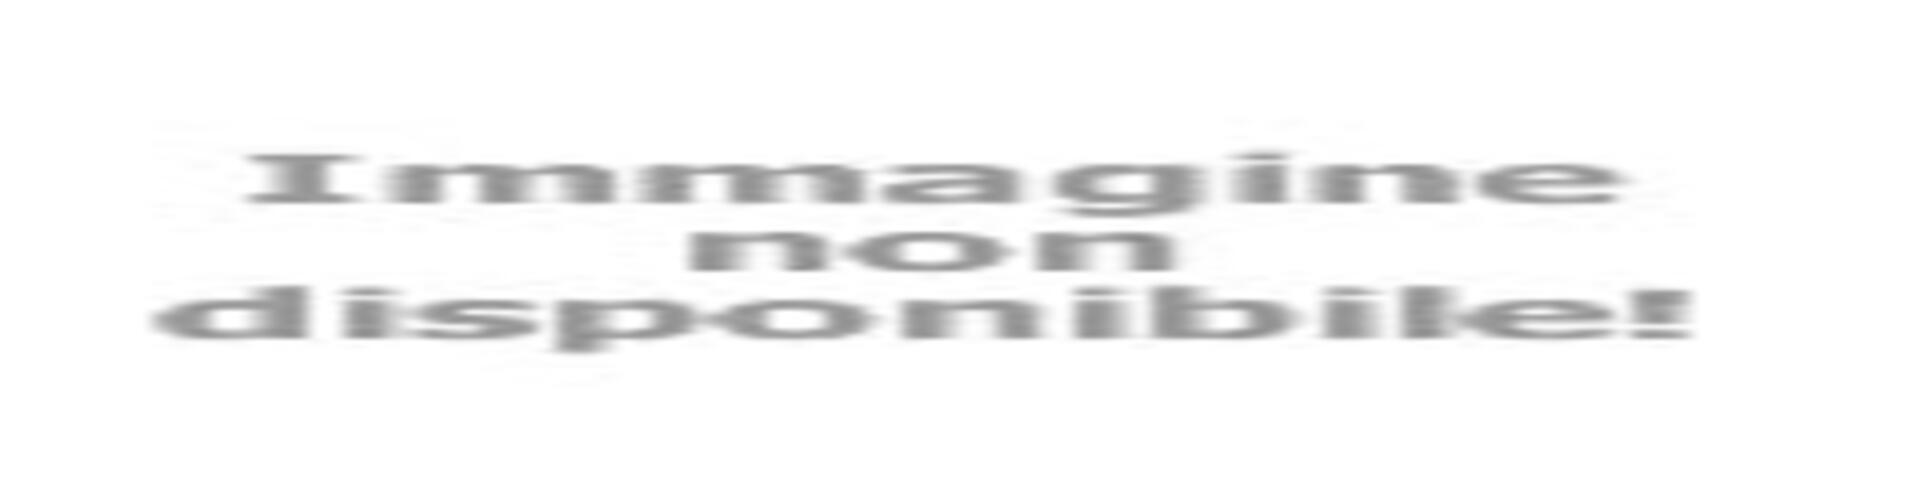 romeo-bosco en hotel 002